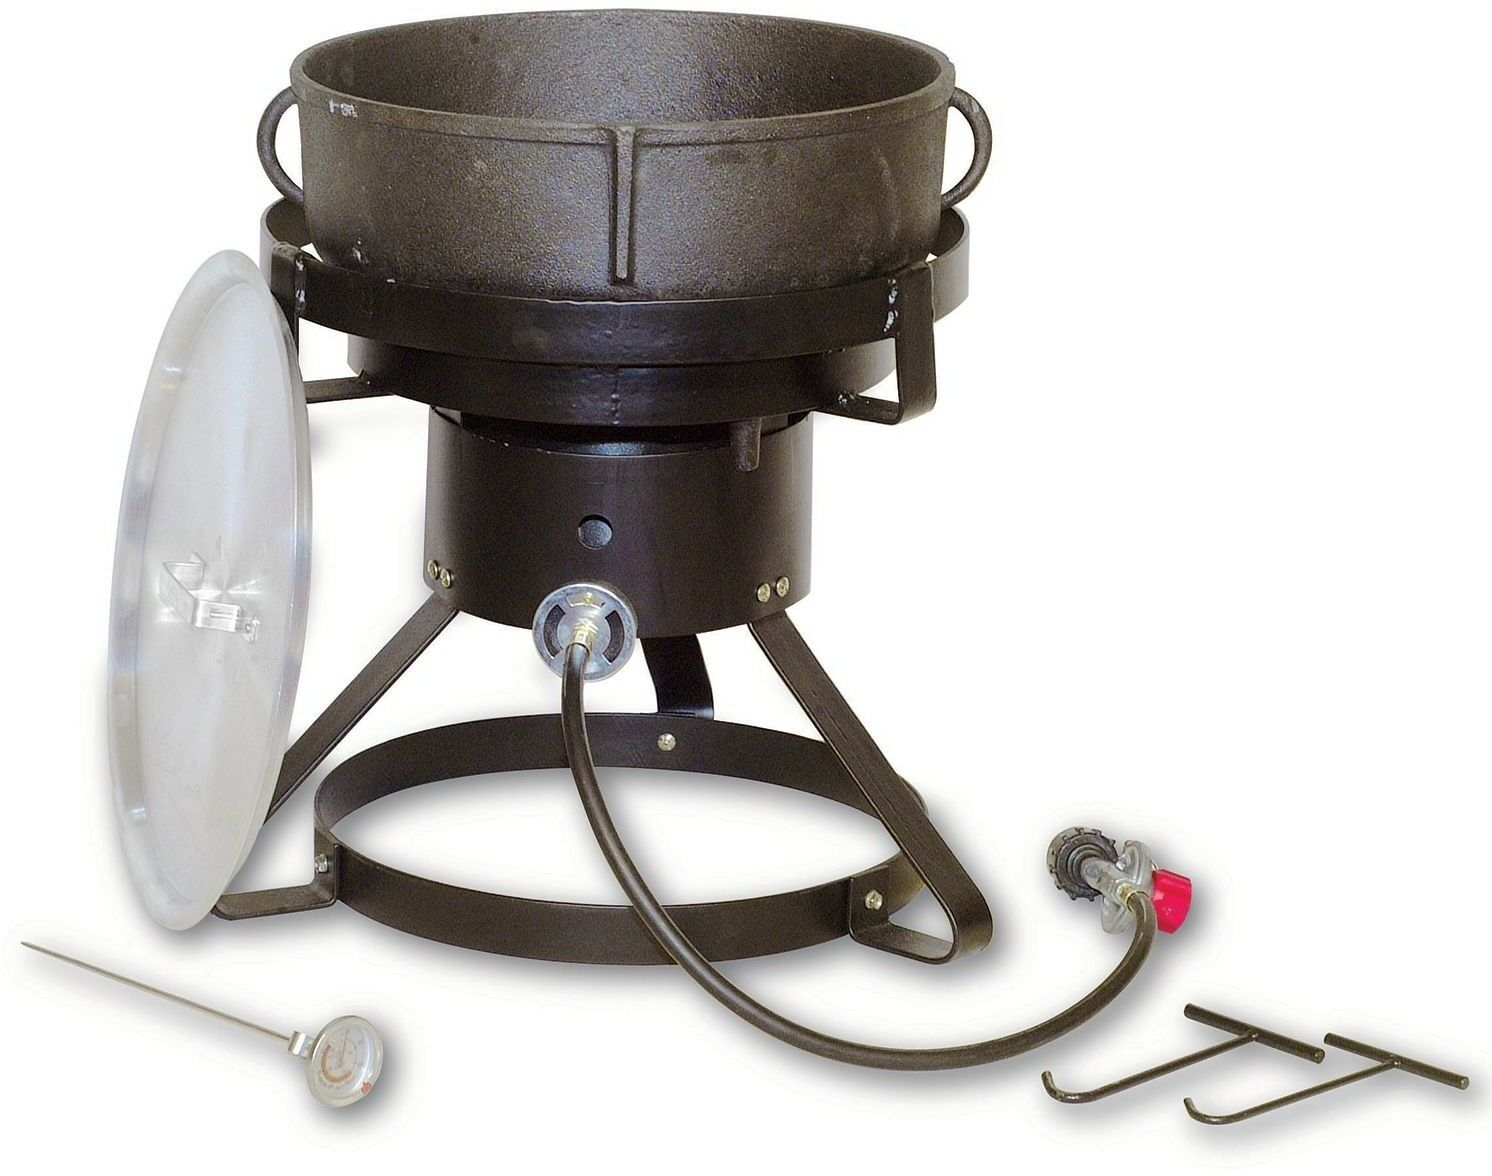 5 Gallon Outdoor Stew Cooker Propane Cast Iron Pot Camping Tailgating Jambalaya